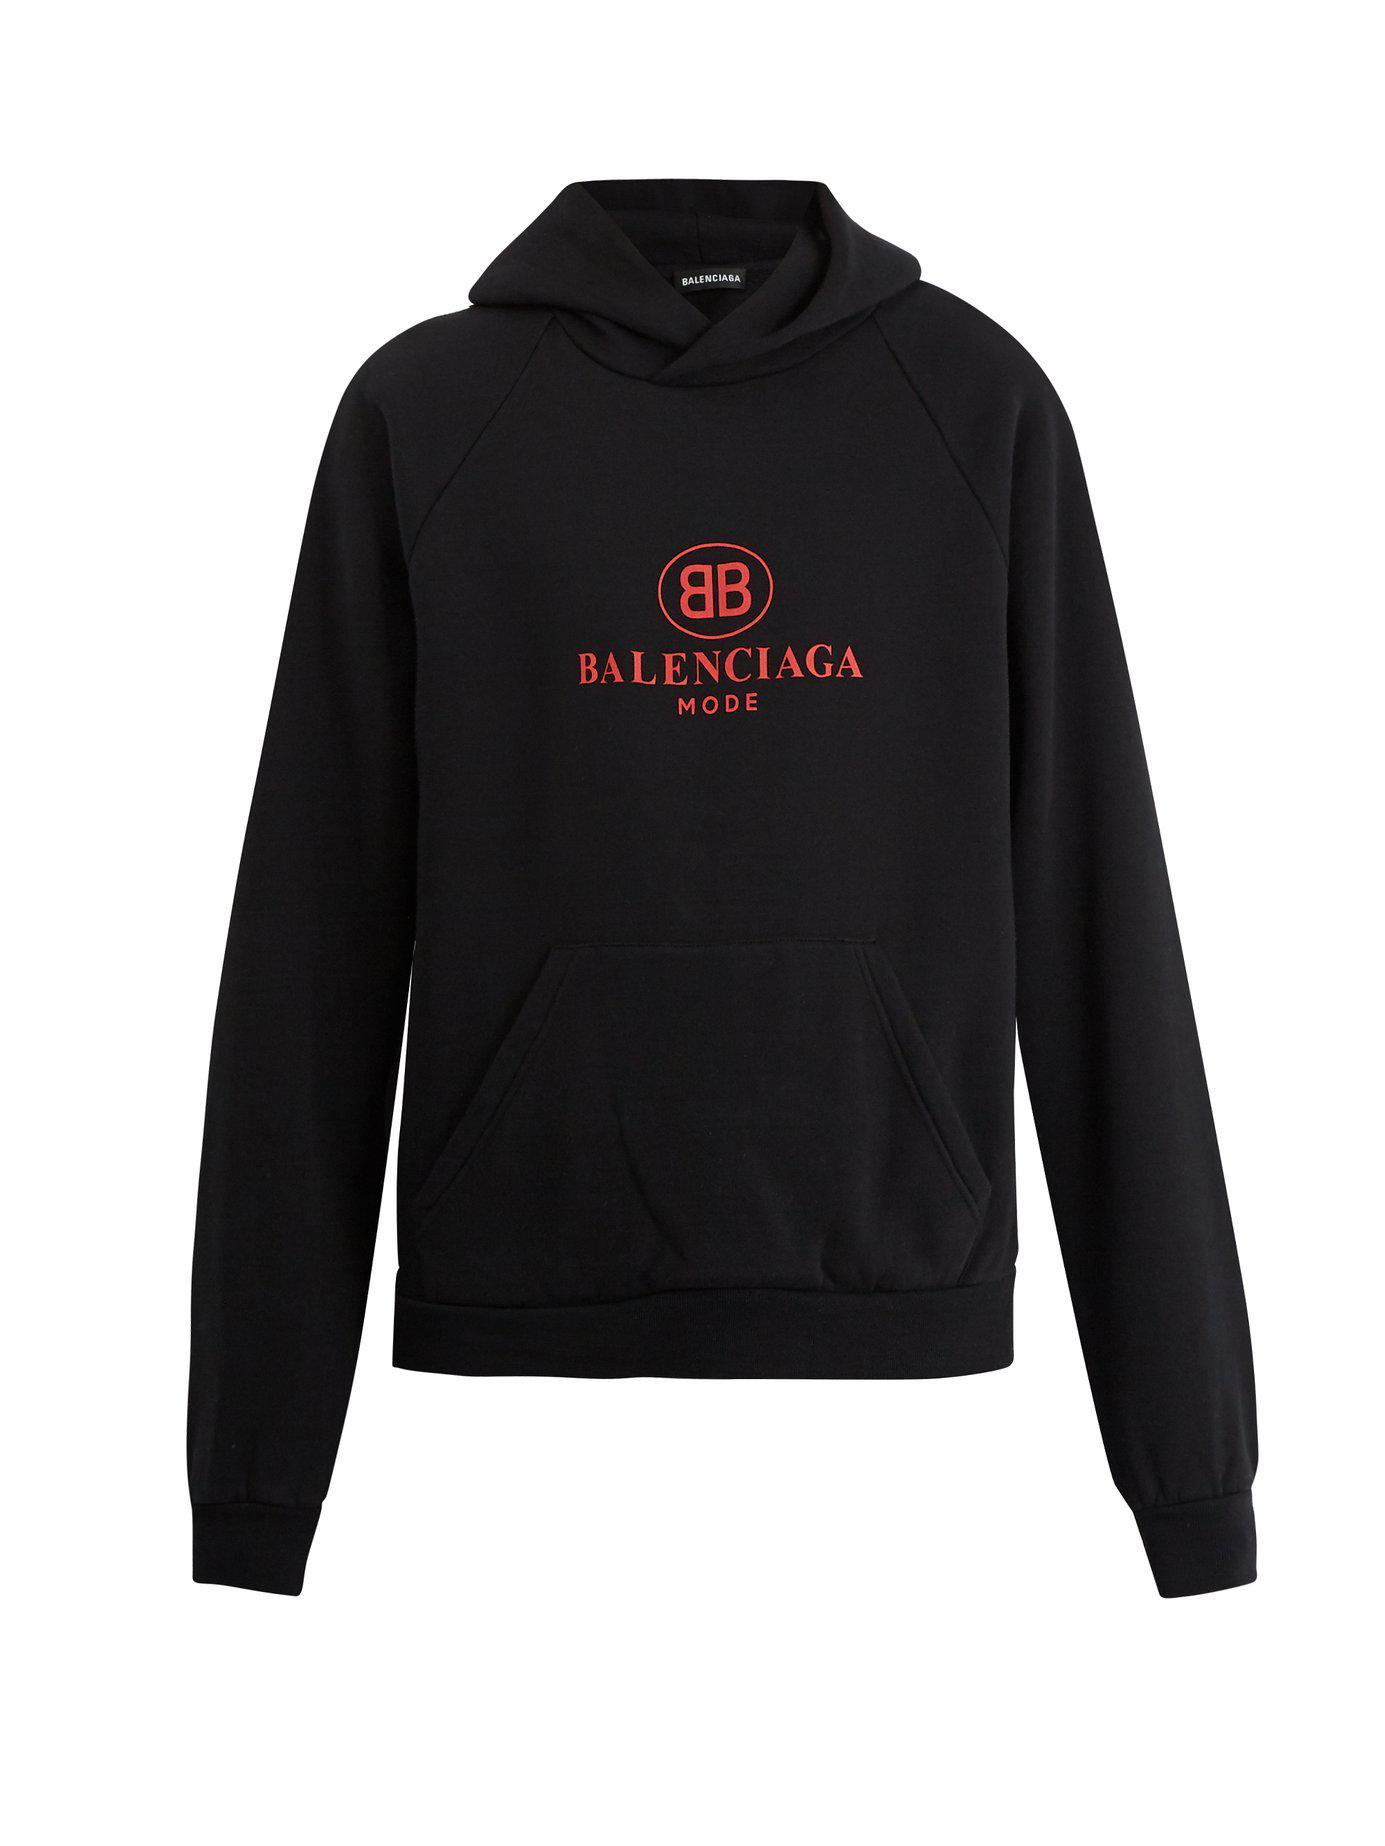 8b1d3b4f9a38 Lyst - Balenciaga Bb Print Hooded Sweatshirt in Black for Men